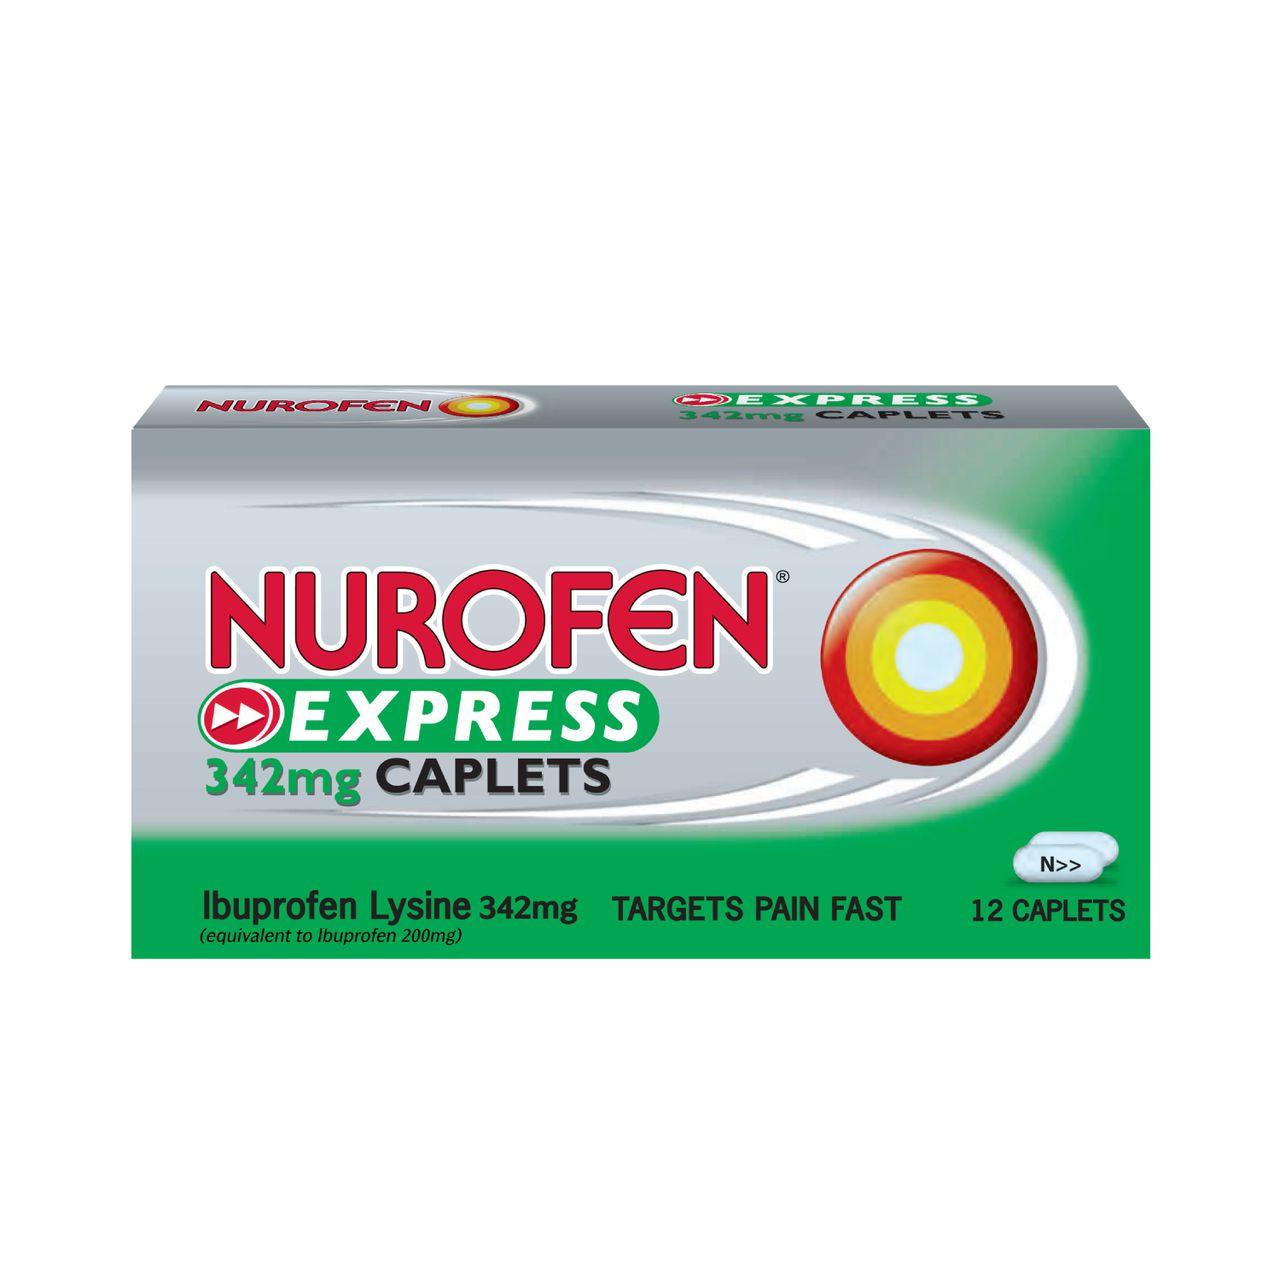 NUROFEN EXPRESS 342mg 12s TABLET